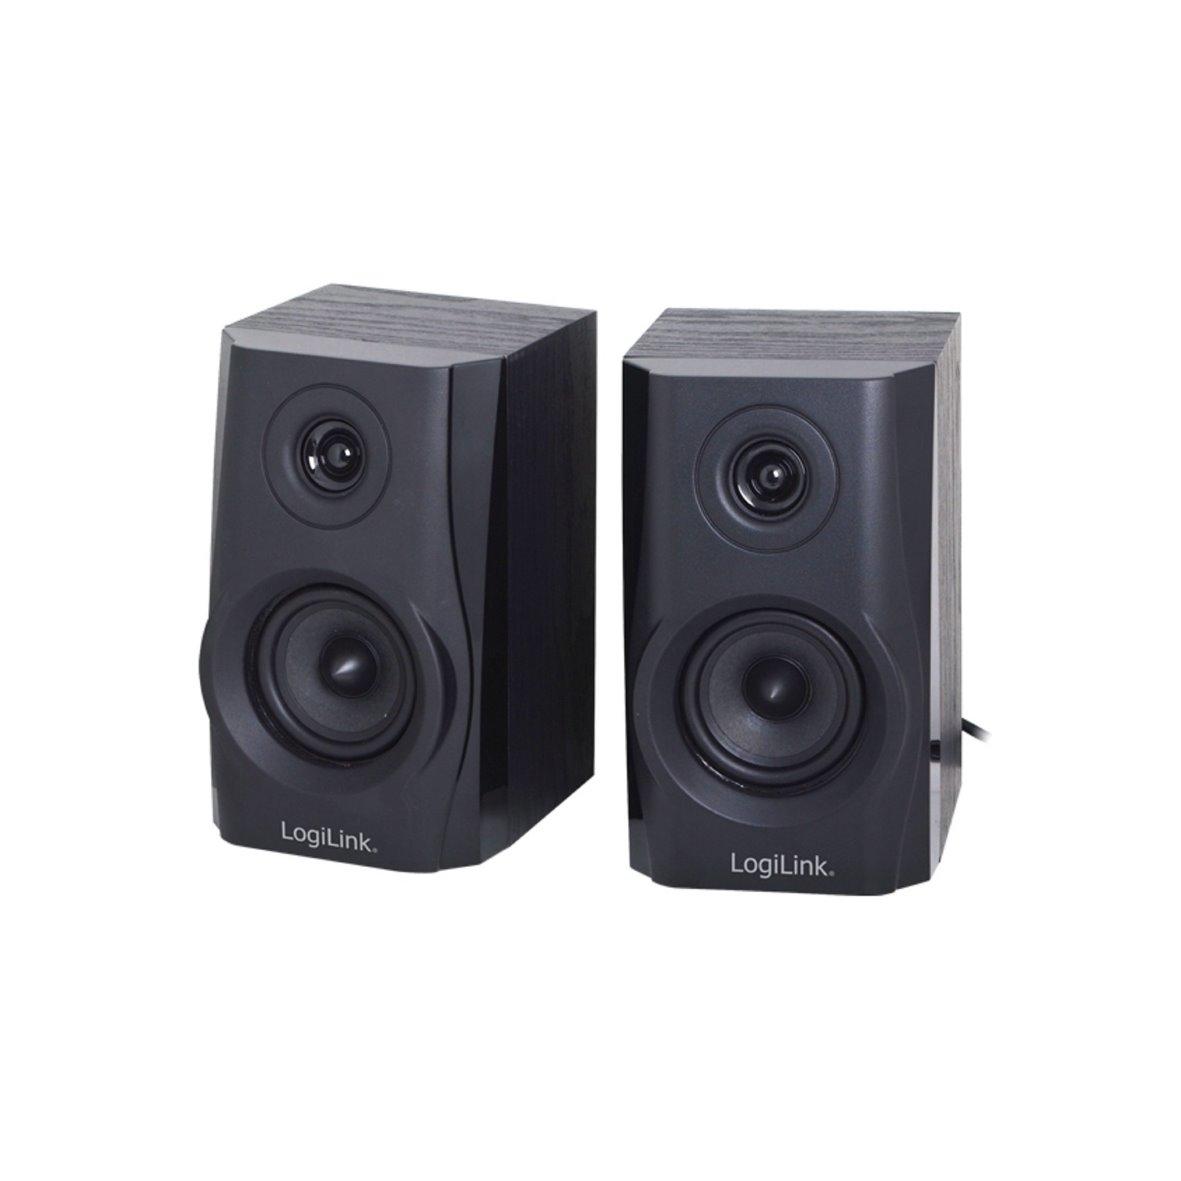 multimedia lautsprecher speaker mini box pc laptop handy. Black Bedroom Furniture Sets. Home Design Ideas